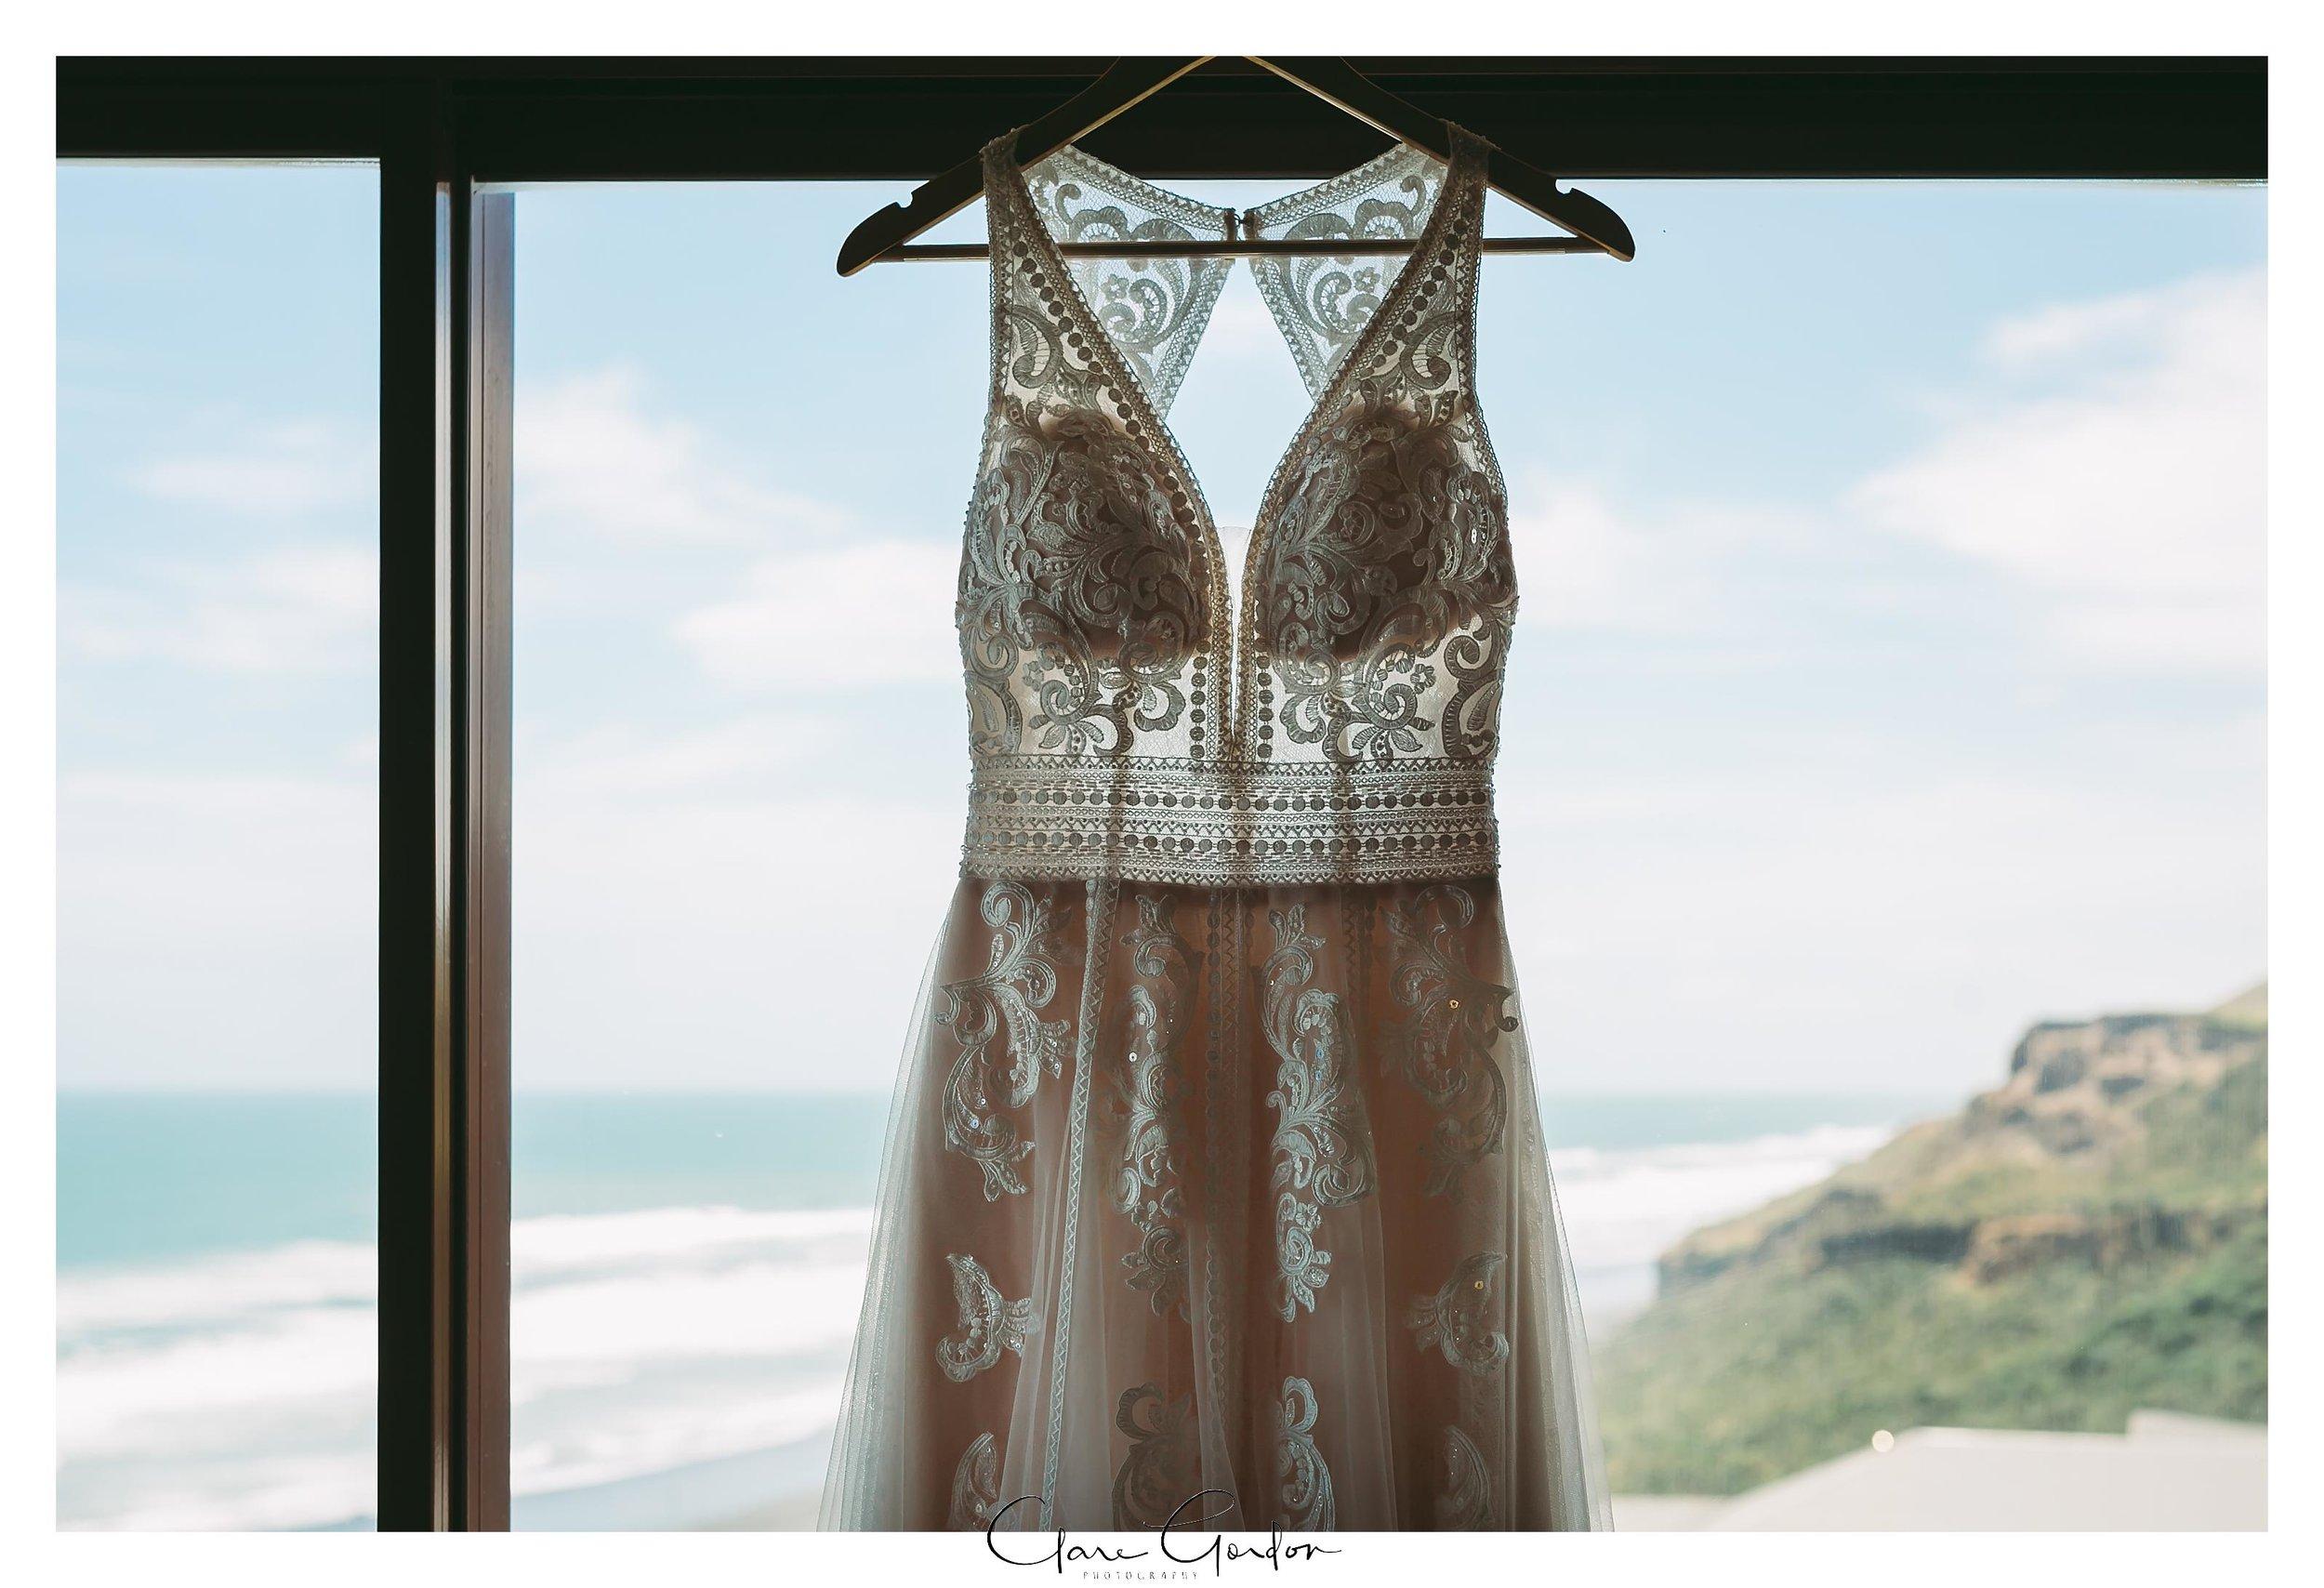 Castaways-resort-waiuku-Wedding-photos-Karioitahi-beach (25).jpg